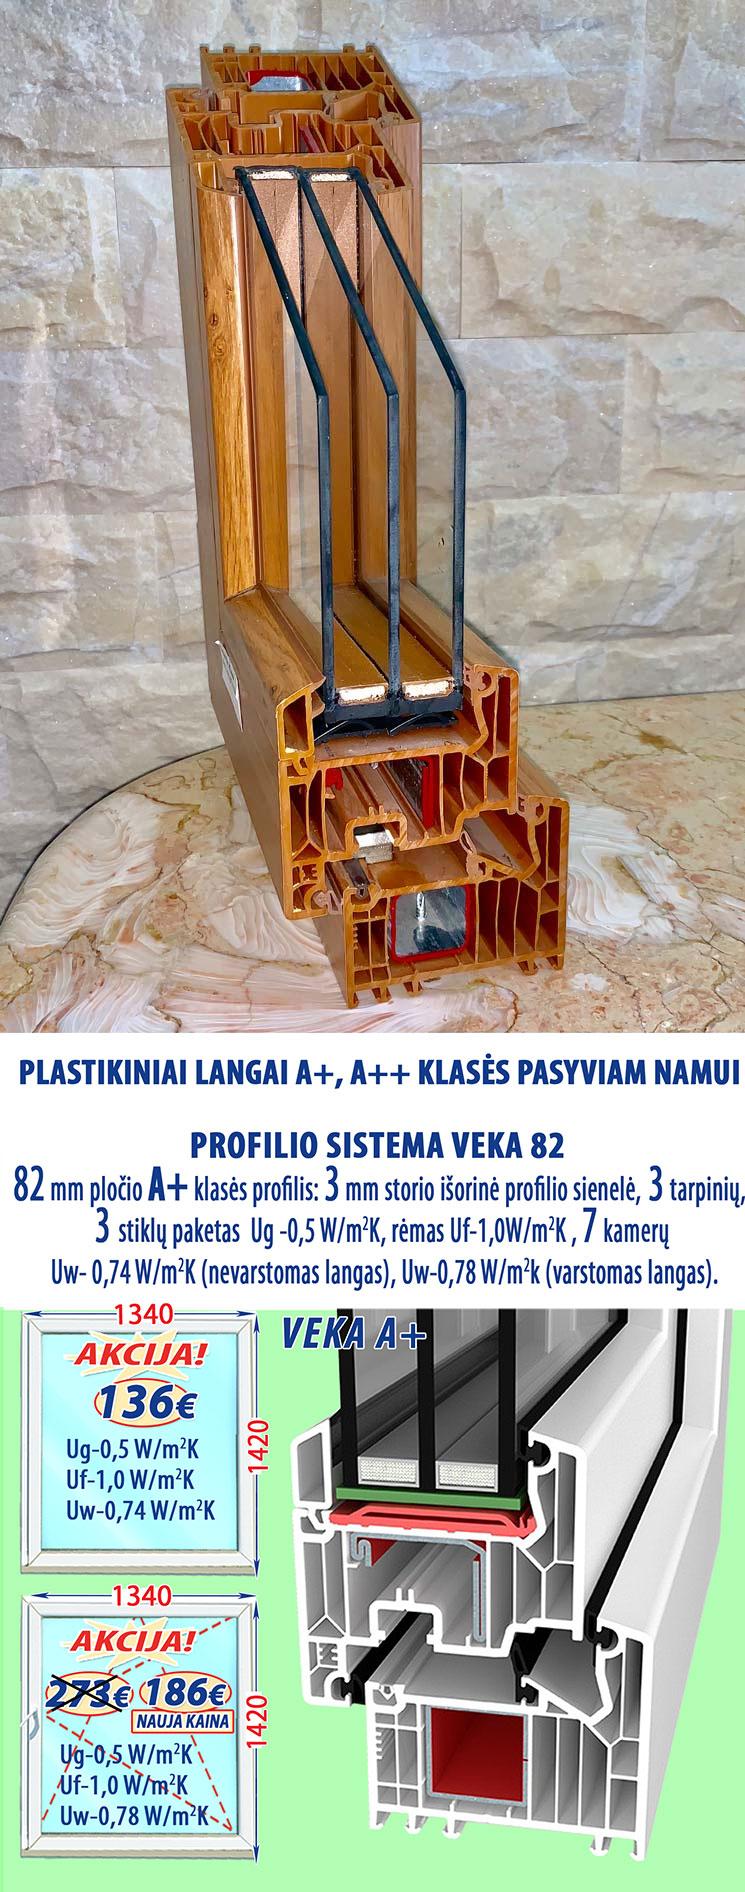 plastikiniai_langai_kaina_veka82-v7